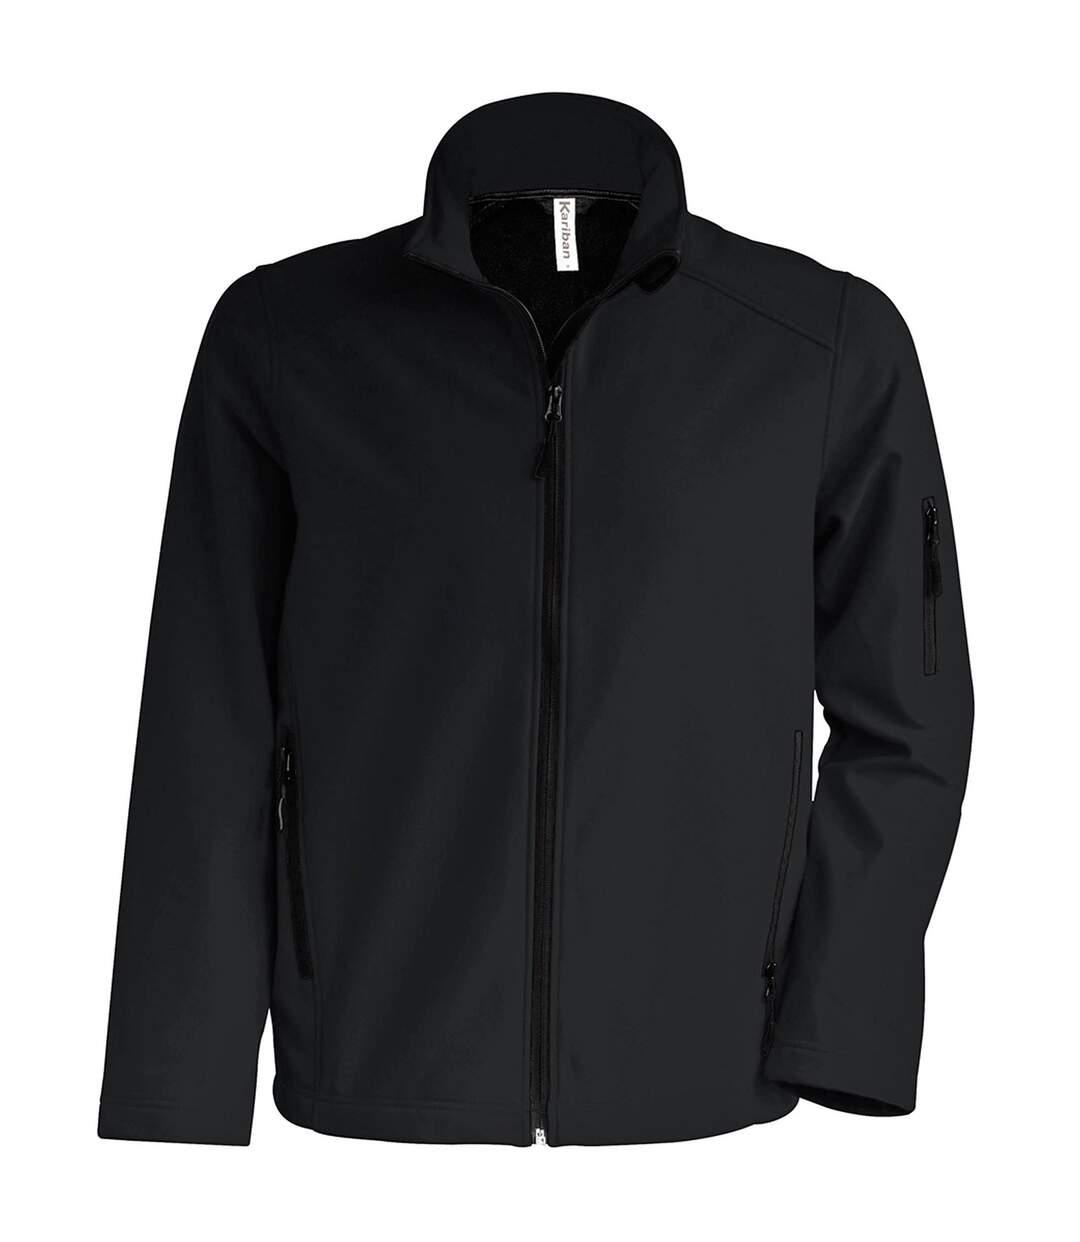 Kariban Mens Contemporary Softshell 3 Layer Performance Jacket (Black) - UTRW715